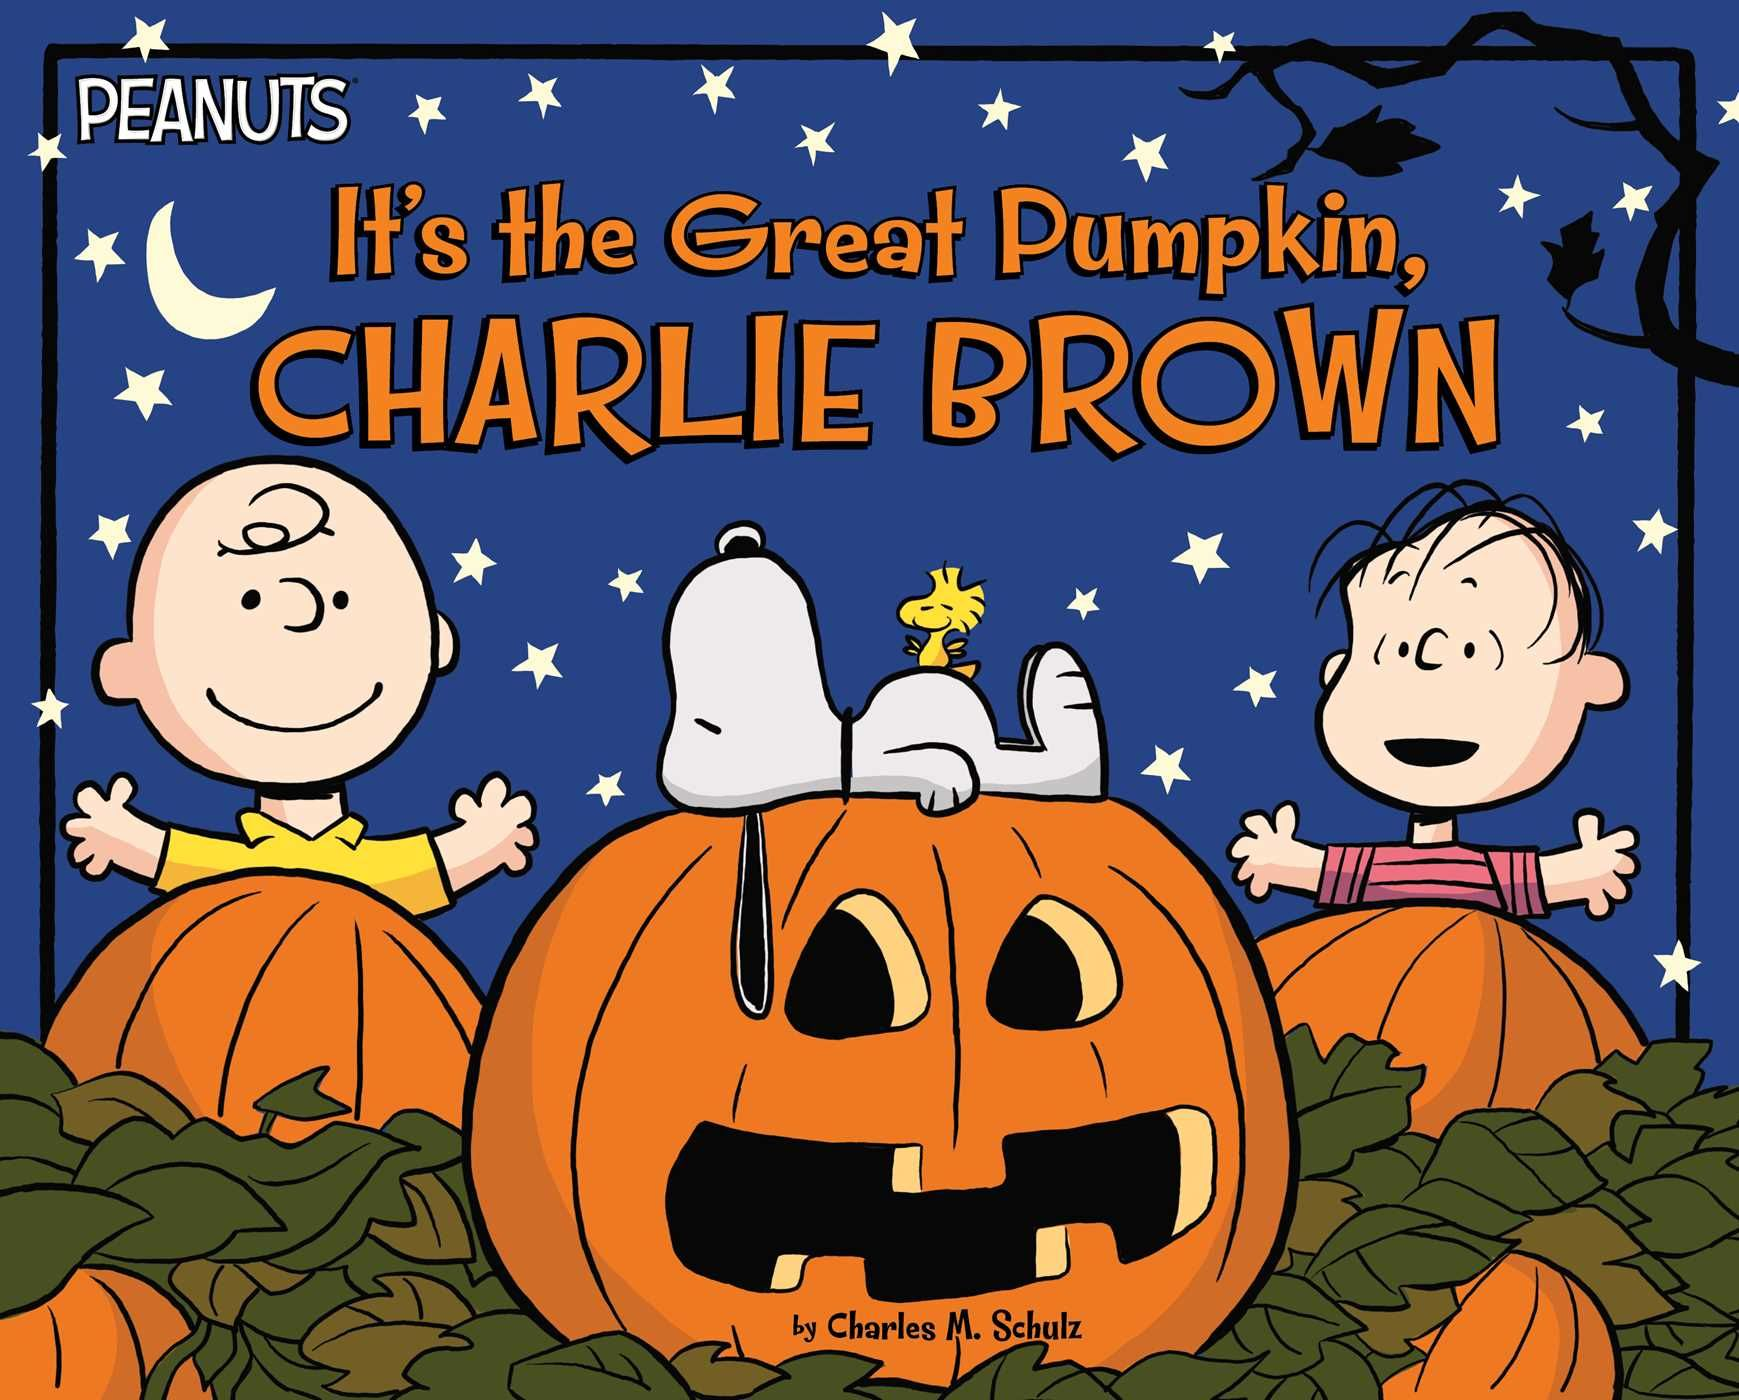 Great Pumpkin Charlie Brown Hd Backgrounds Great Pumpkin Charlie